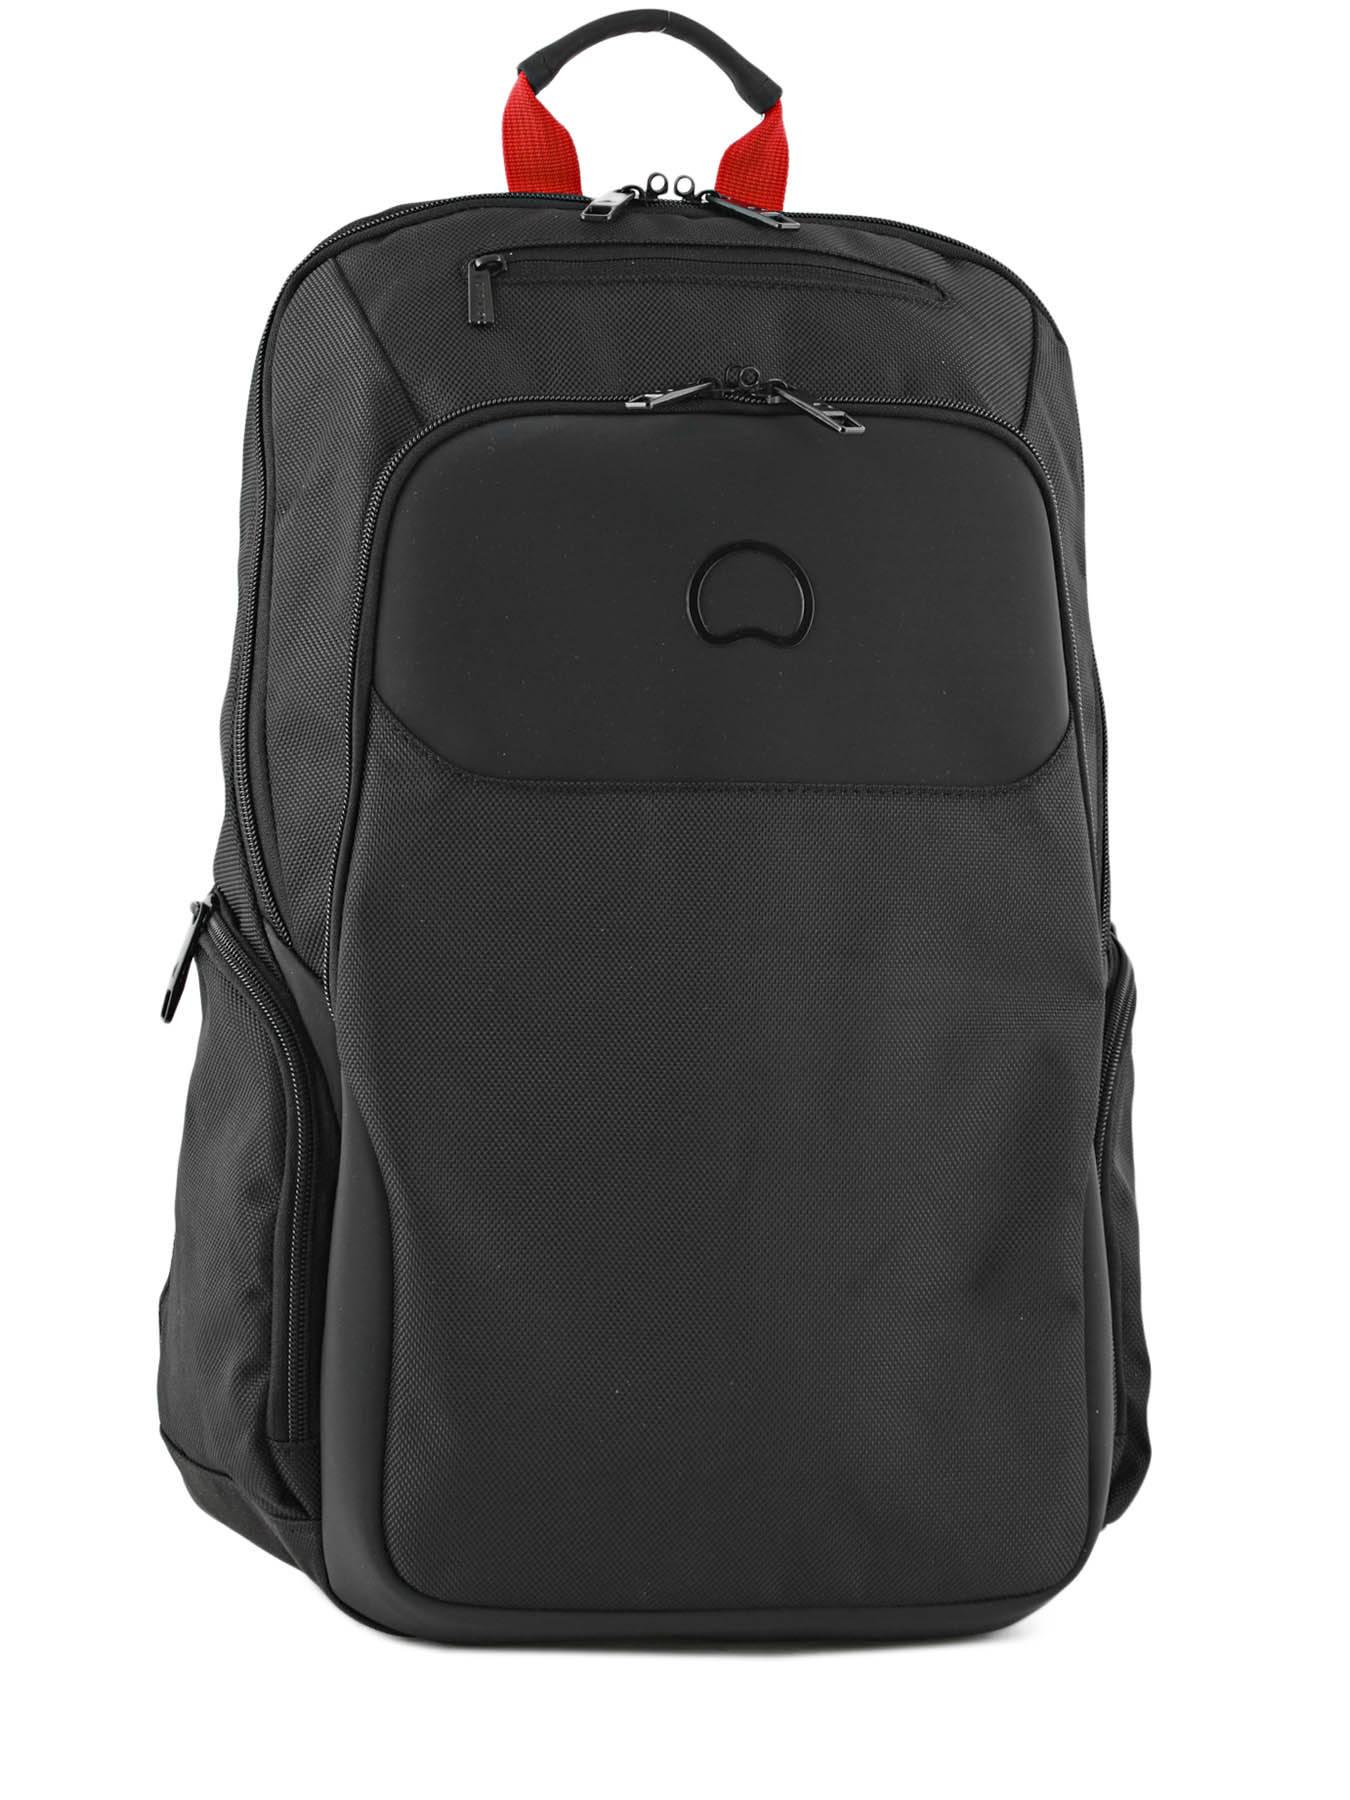 712d6ce47d7e ... Backpack 2 Compartments Delsey Black parvis + 3944603 ...